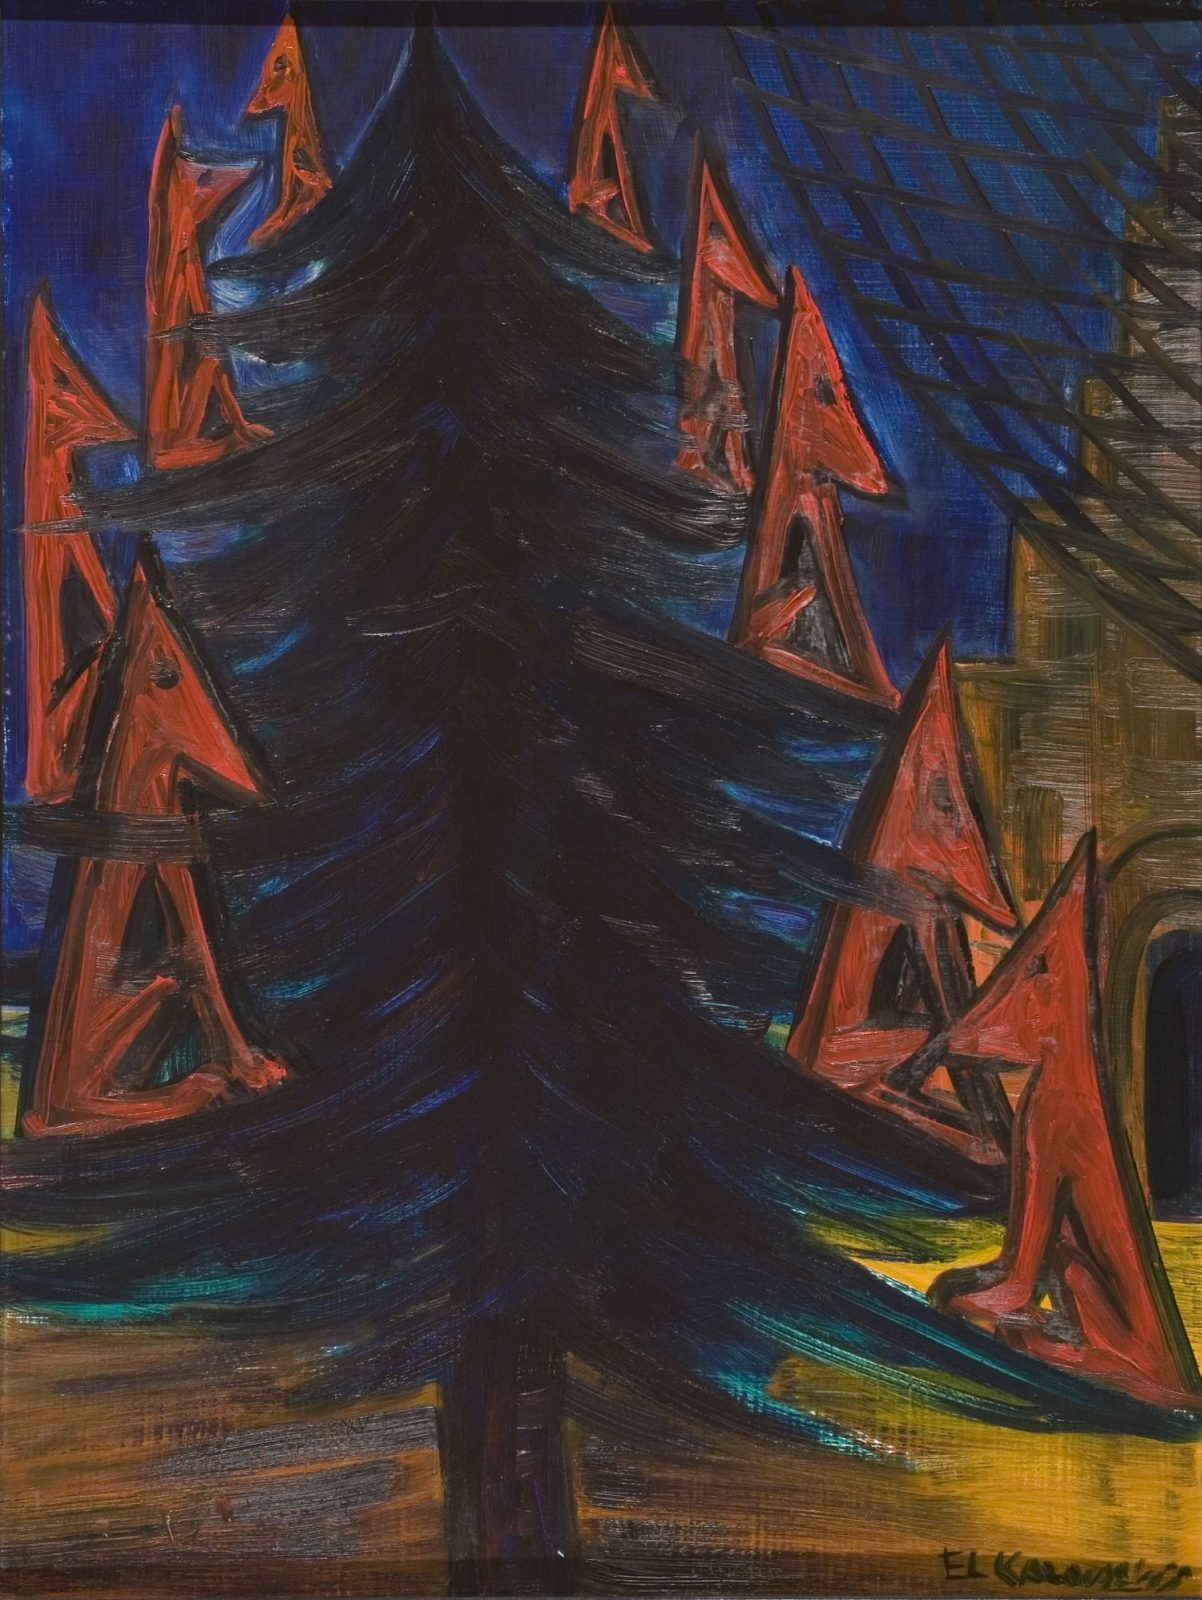 El Kazovszkij: Nine Wolves on the Christmas Tree